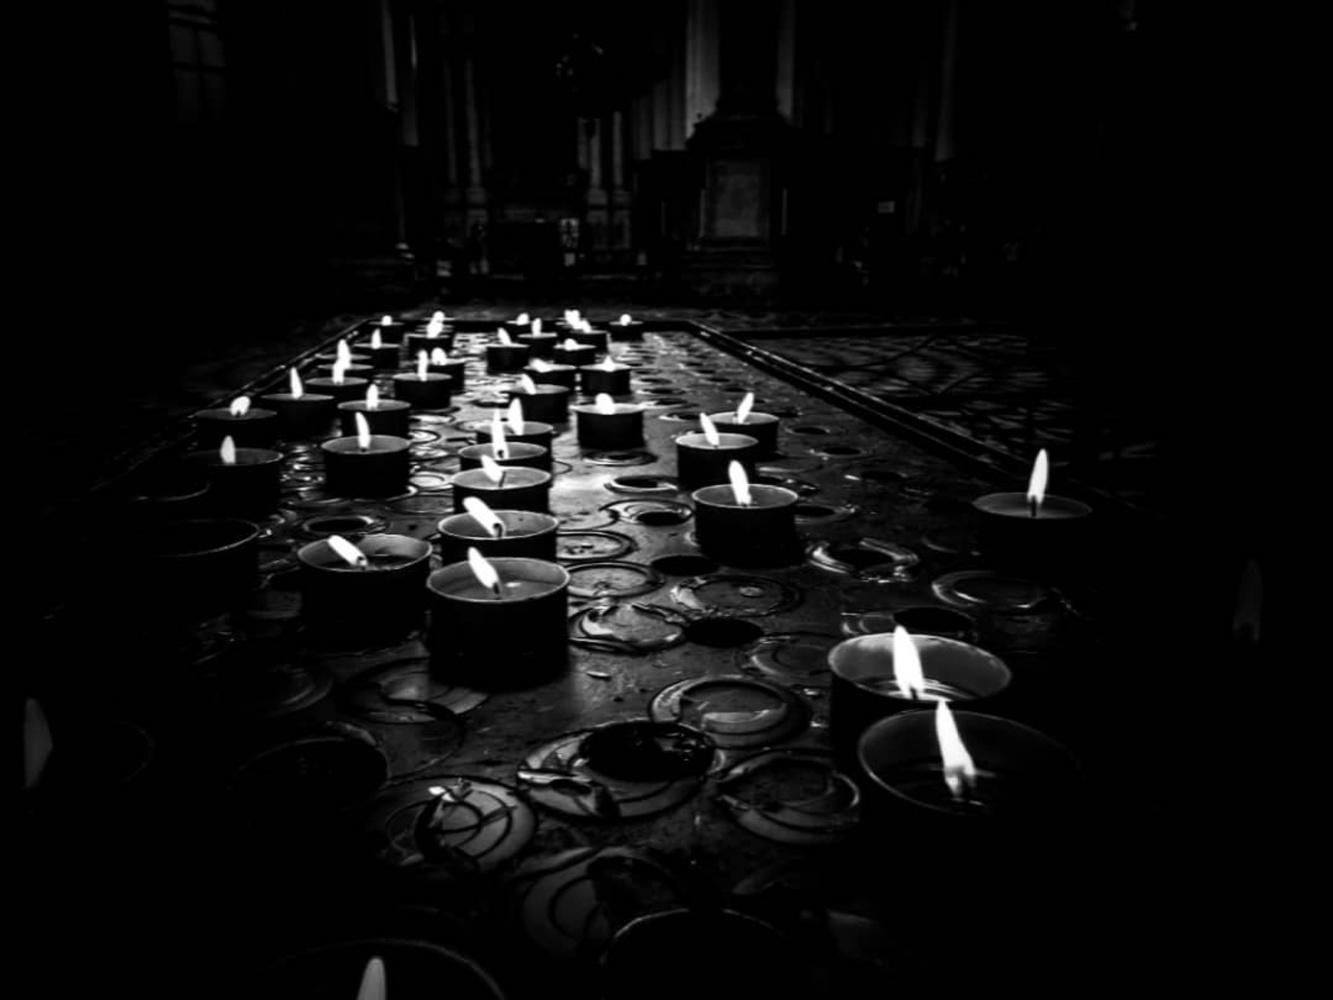 Candles by Goran Avramovic